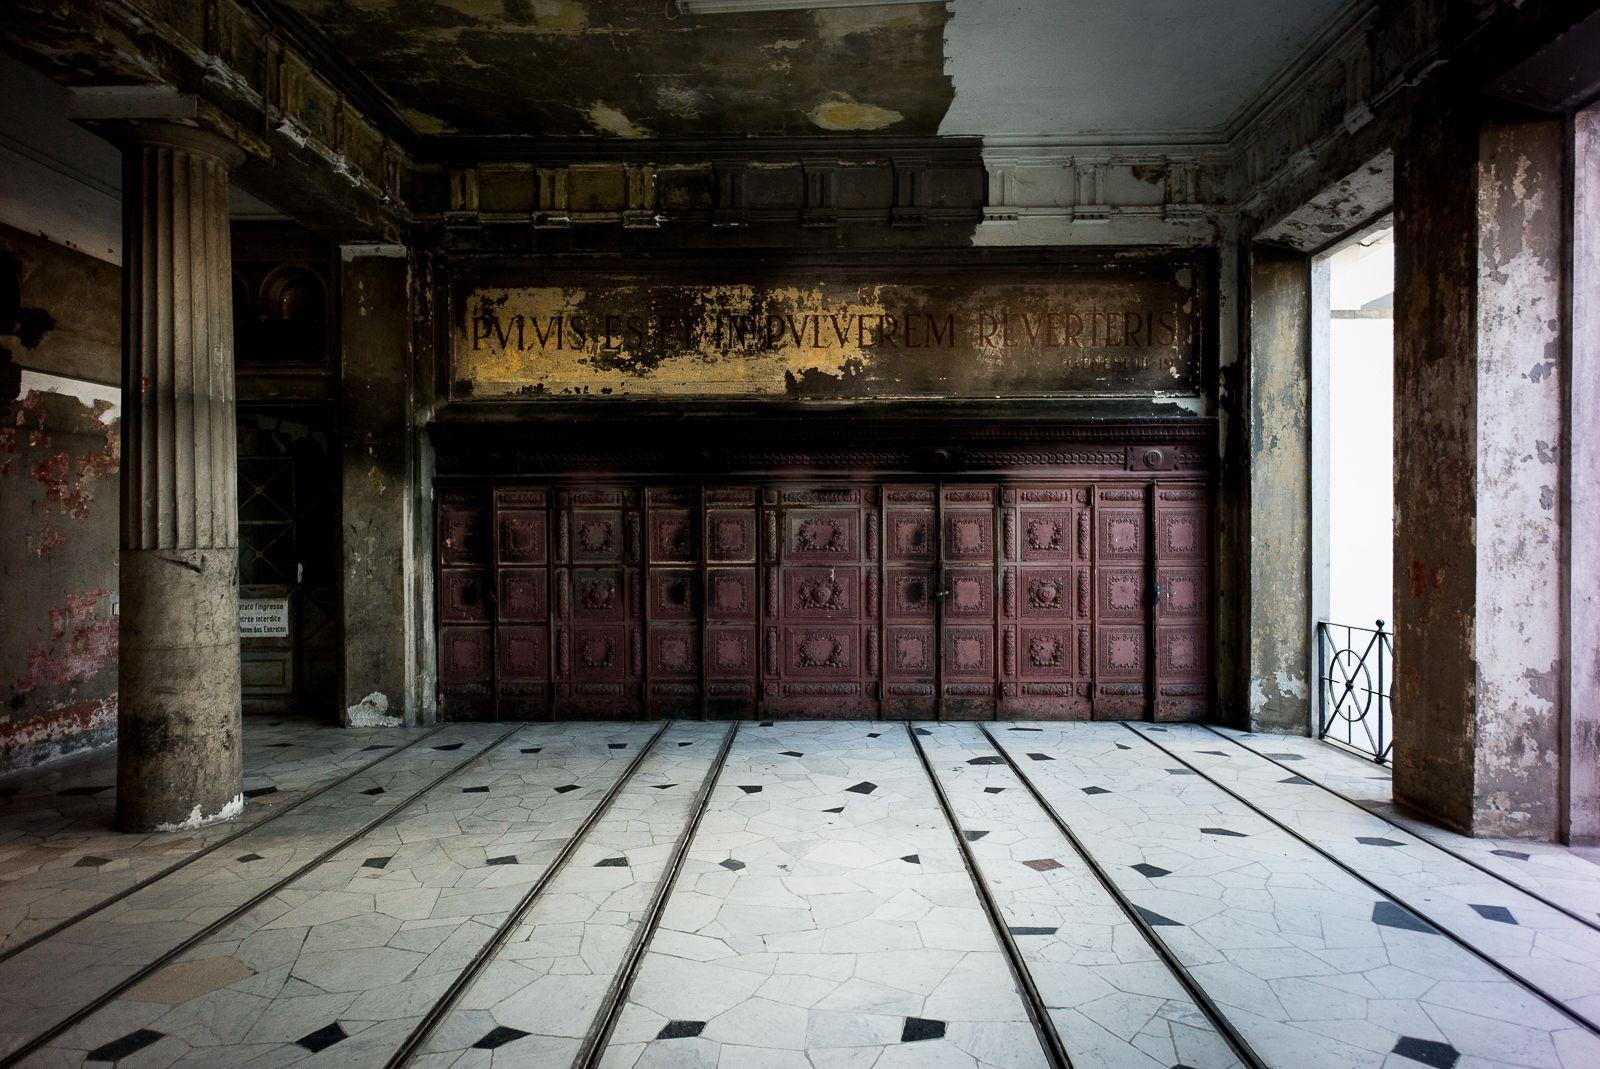 cimitero-monumentale-milano-interno.jpg